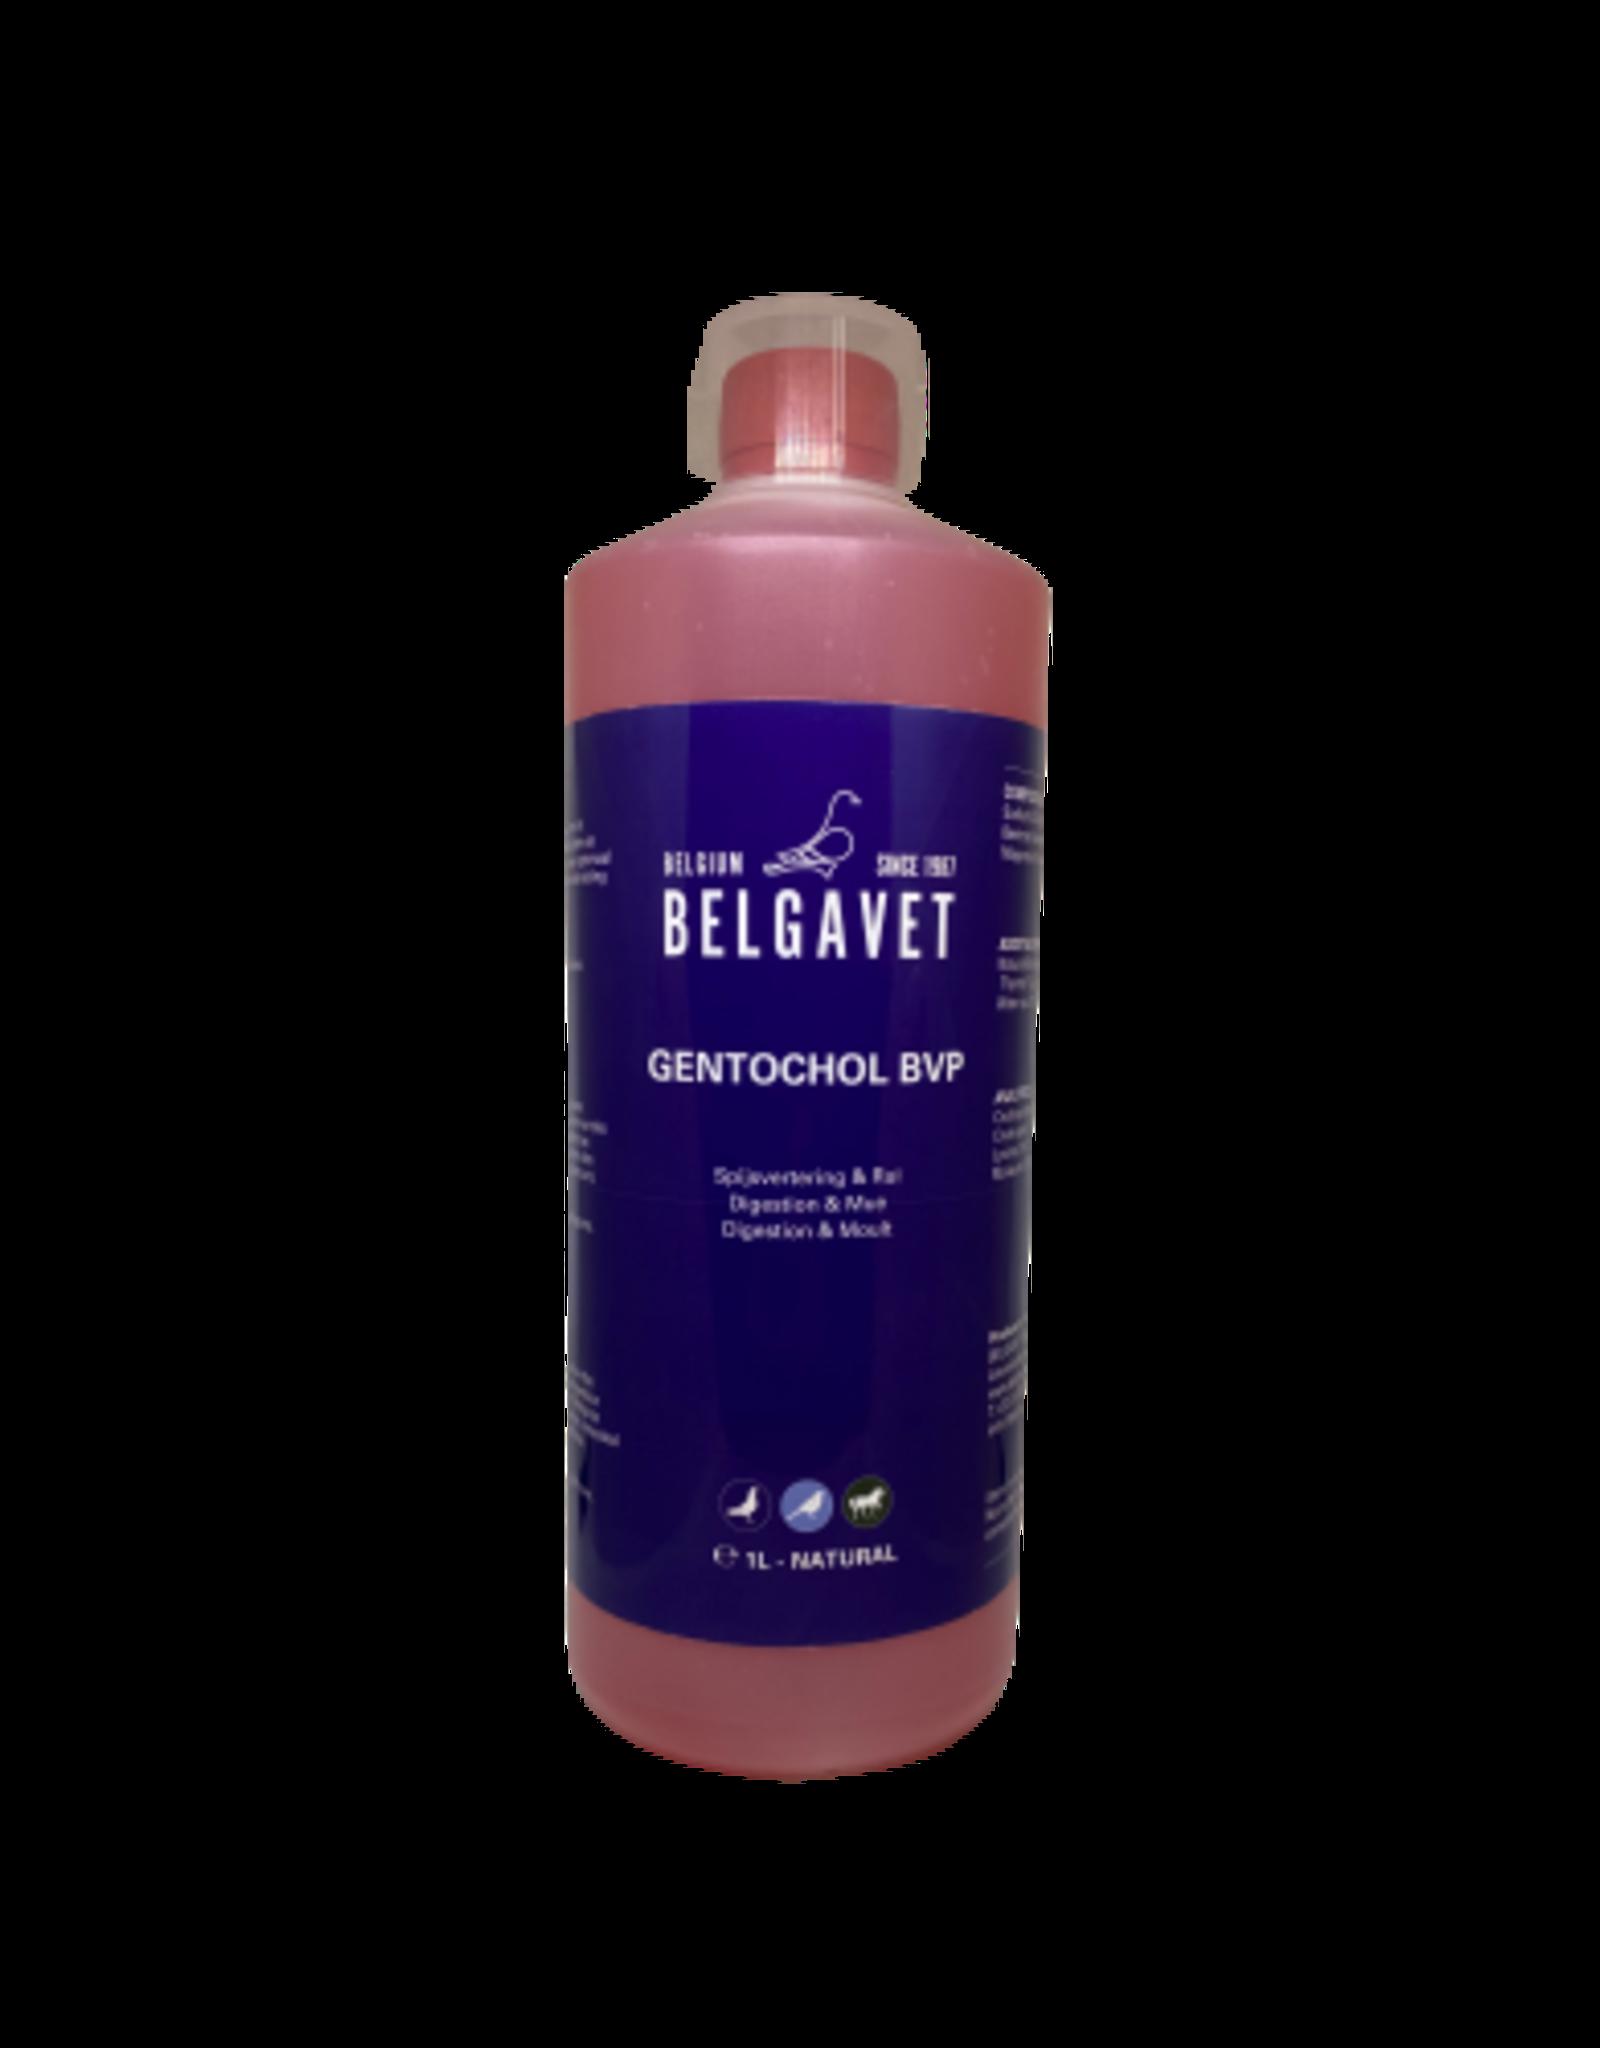 Belga vet Gentochol - 1 Liter